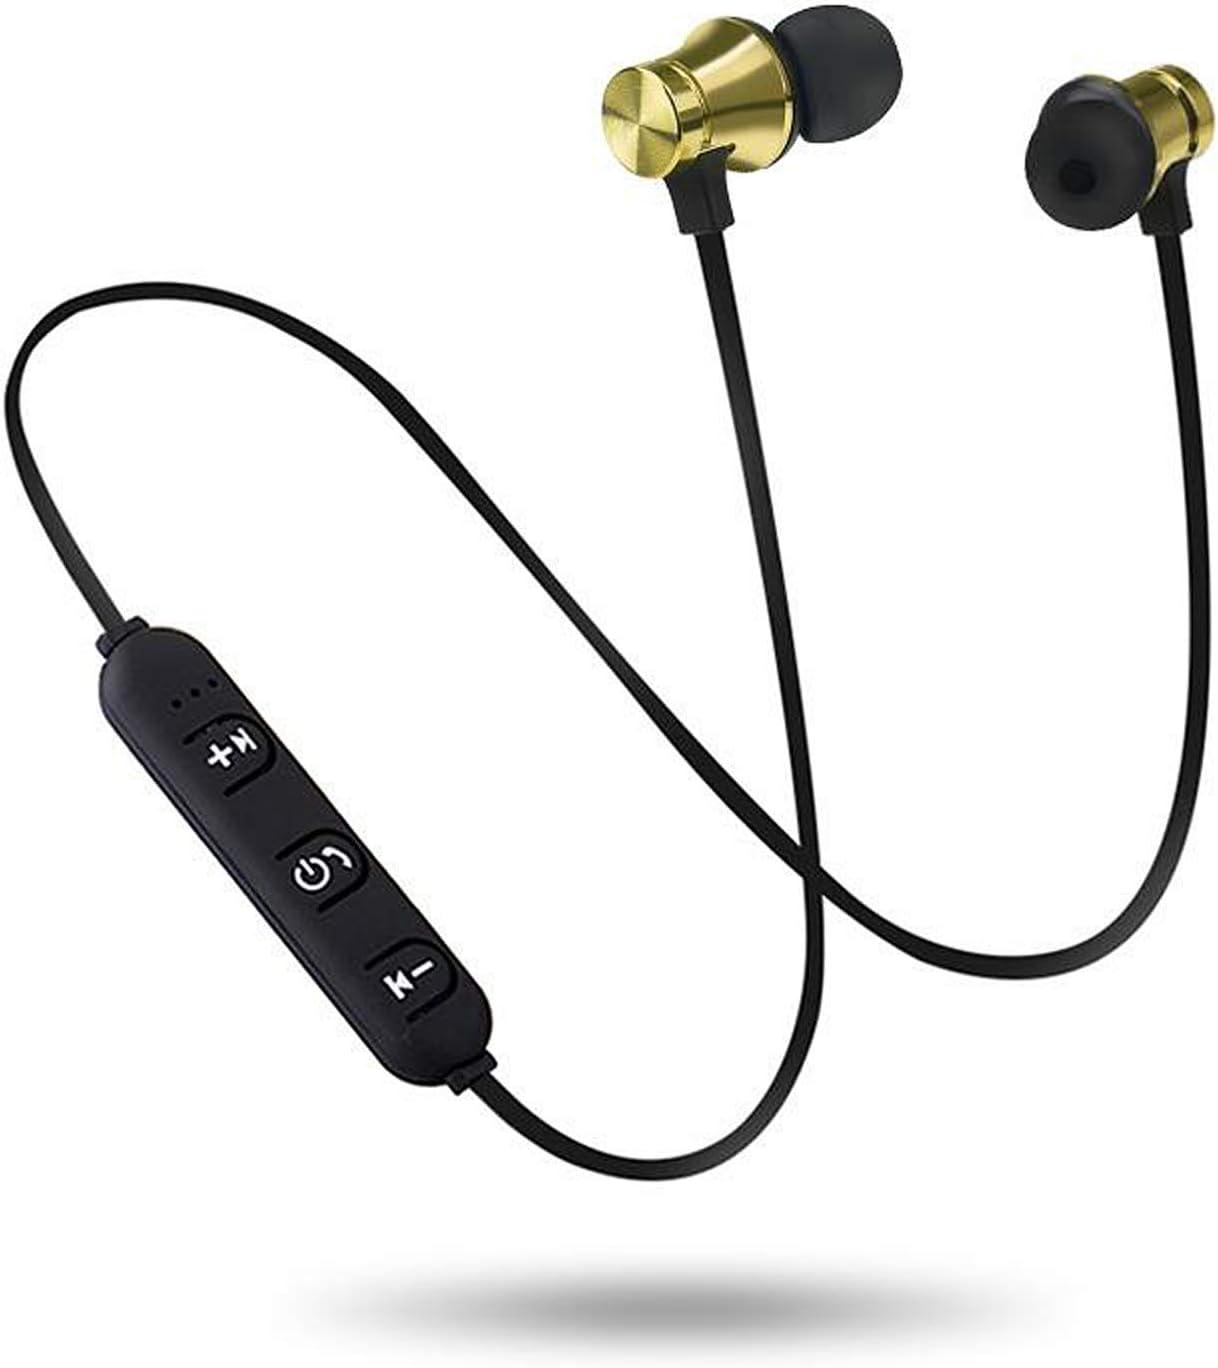 Wireless Bluetooth 4.2 Headphones Stereo Headset Sport in Ear Earphone Microphone by Creative Curiosities